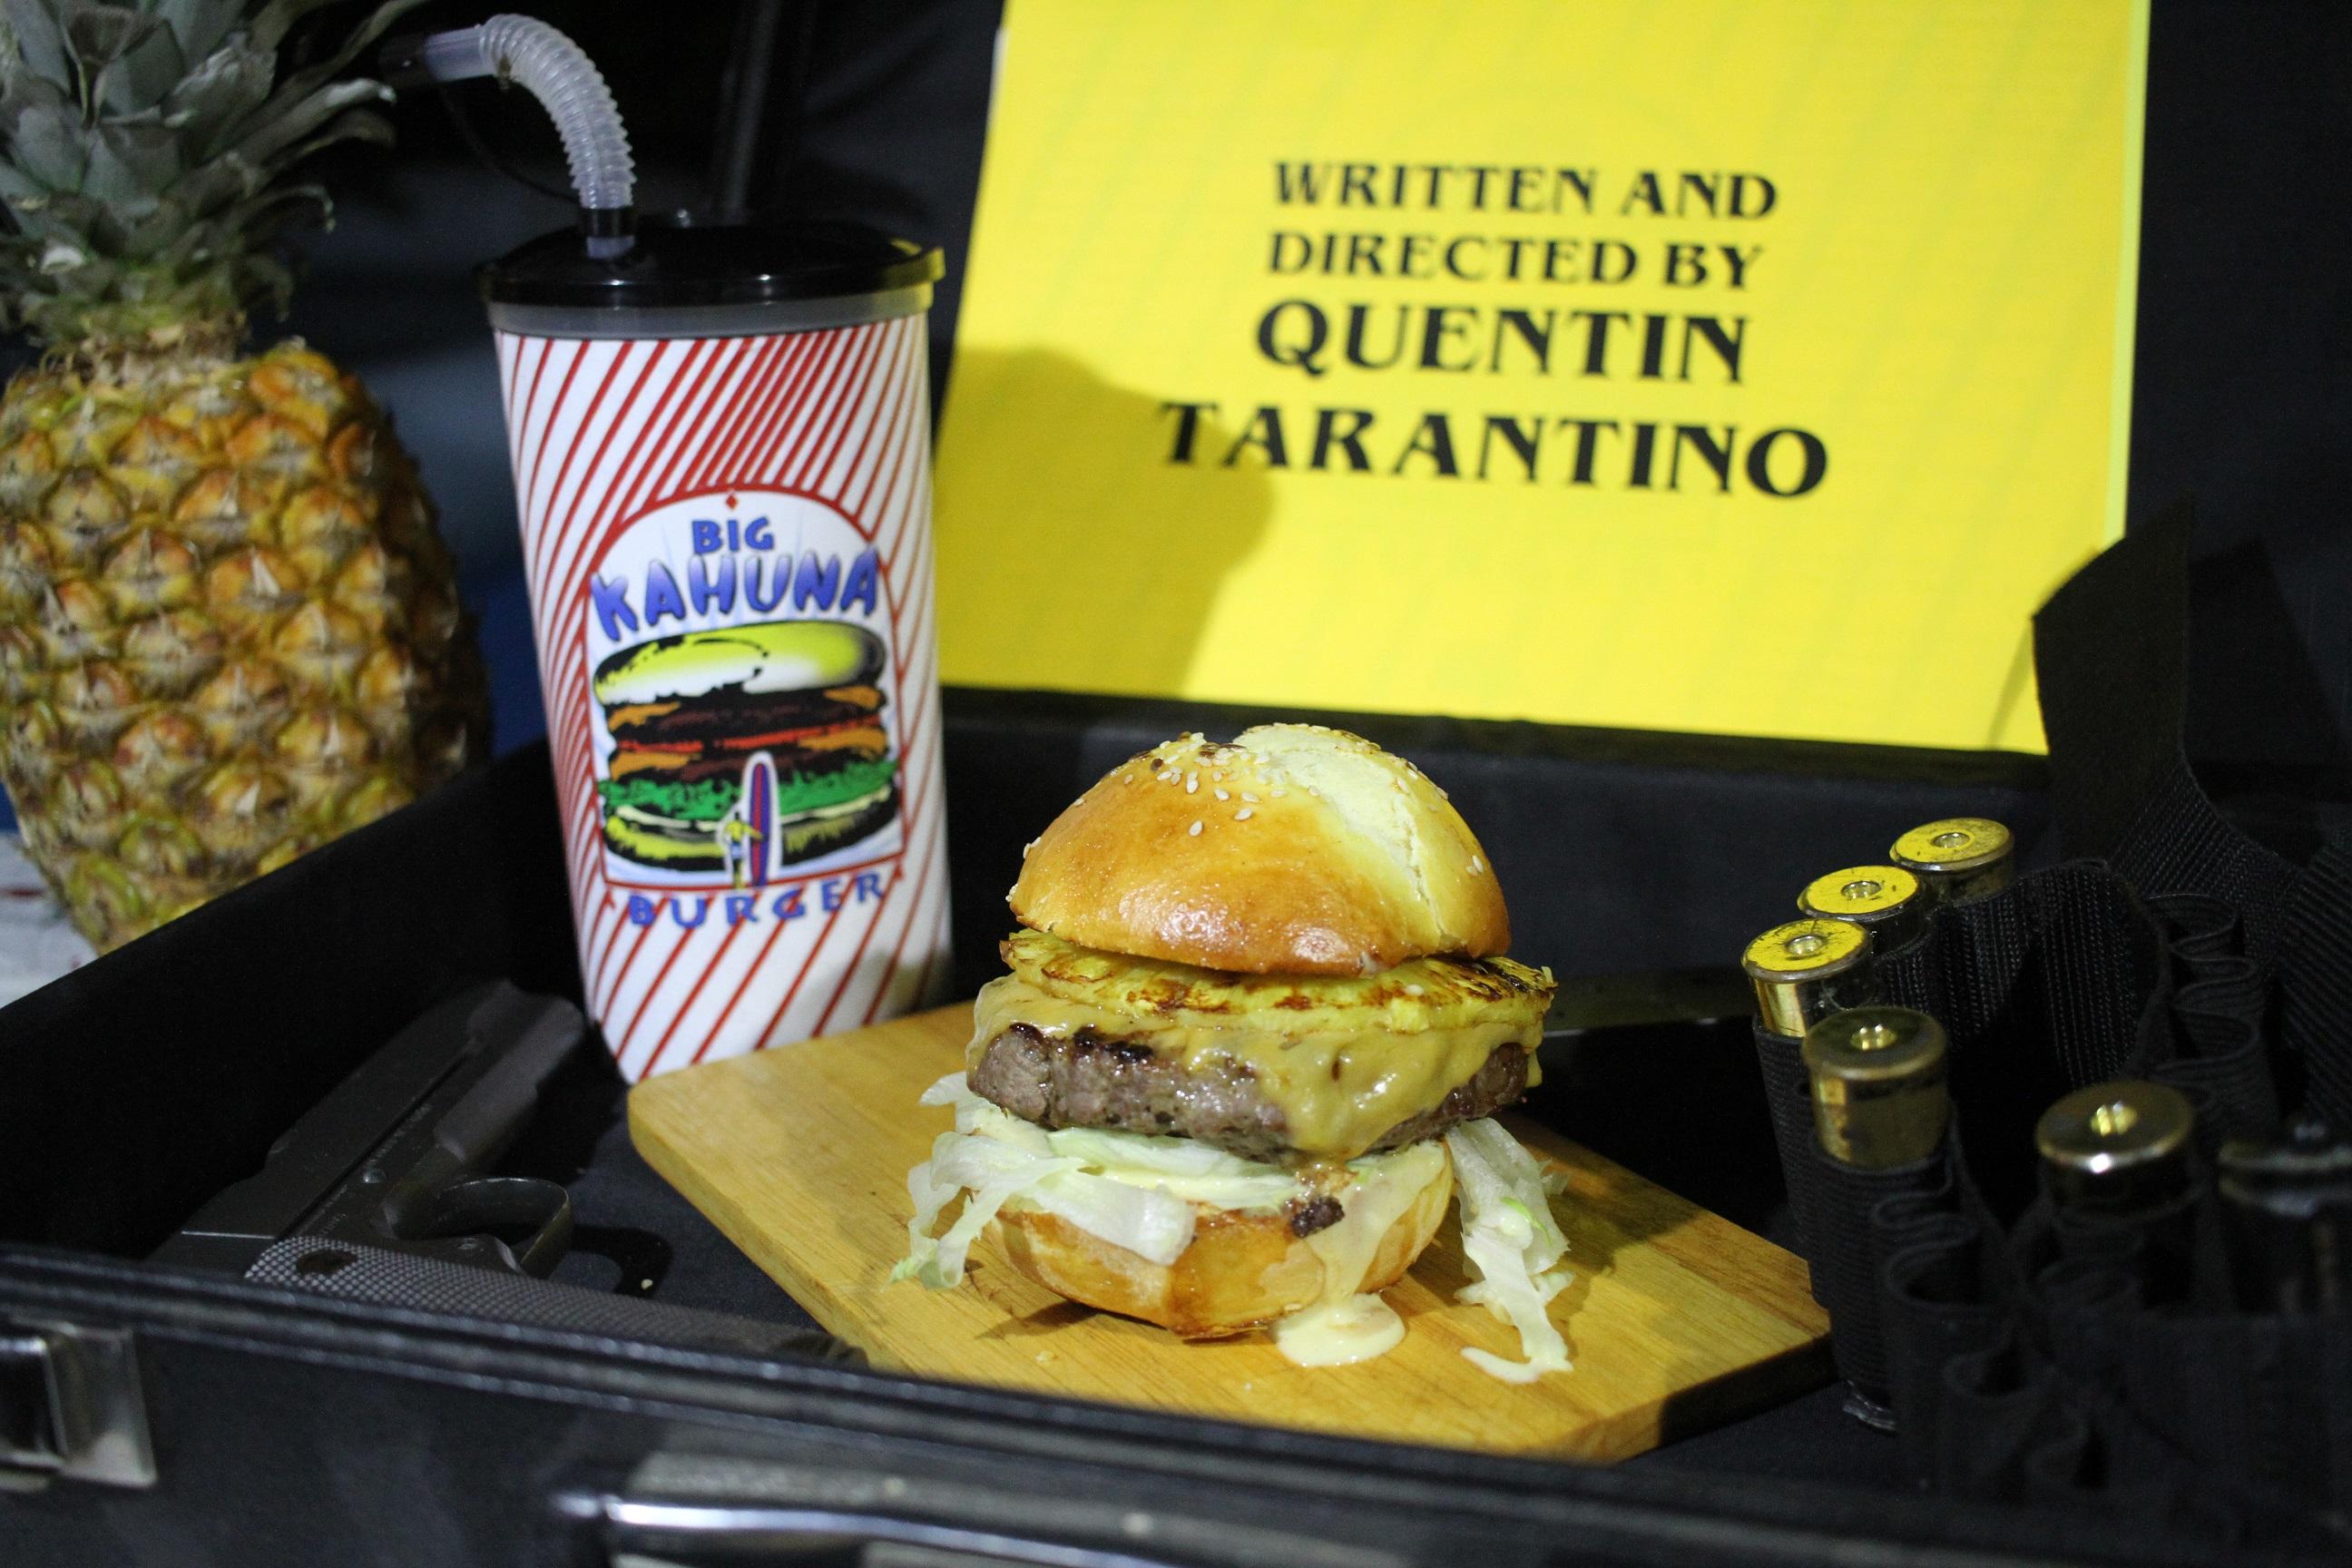 szmk_big_kahuna_burger_diy_recept_recepie_quentin_tarantino_pulp_fiction_csinald_magad_ponyvaregeny_jules_vincent_mia_wallace_zed_tasty_burger_royal_with_cheese_41.JPG